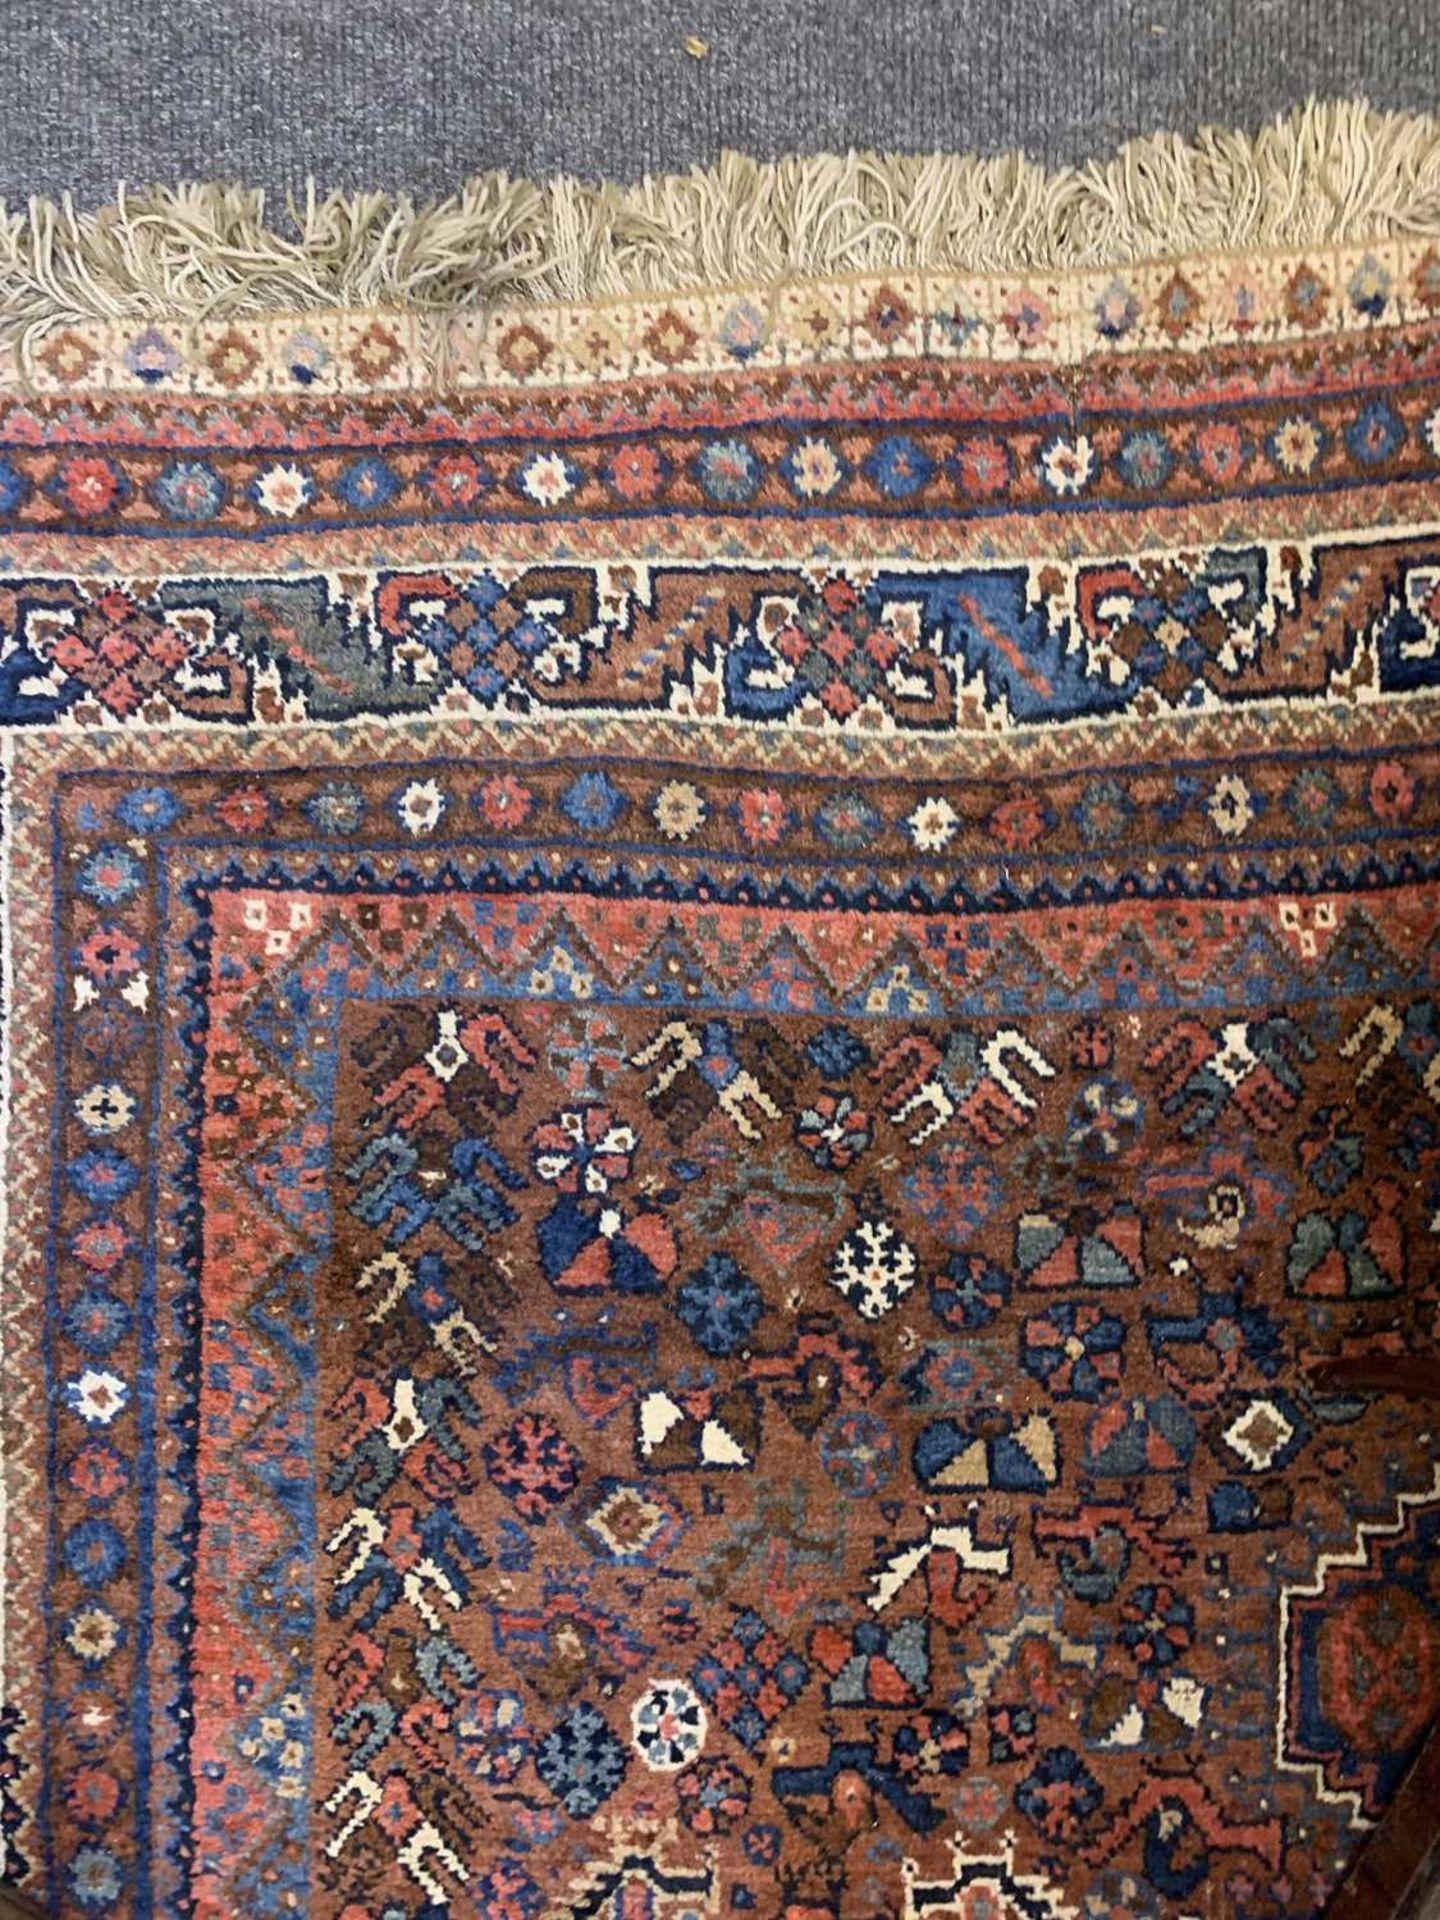 A South West Persian Khamseh carpet, - Image 13 of 17